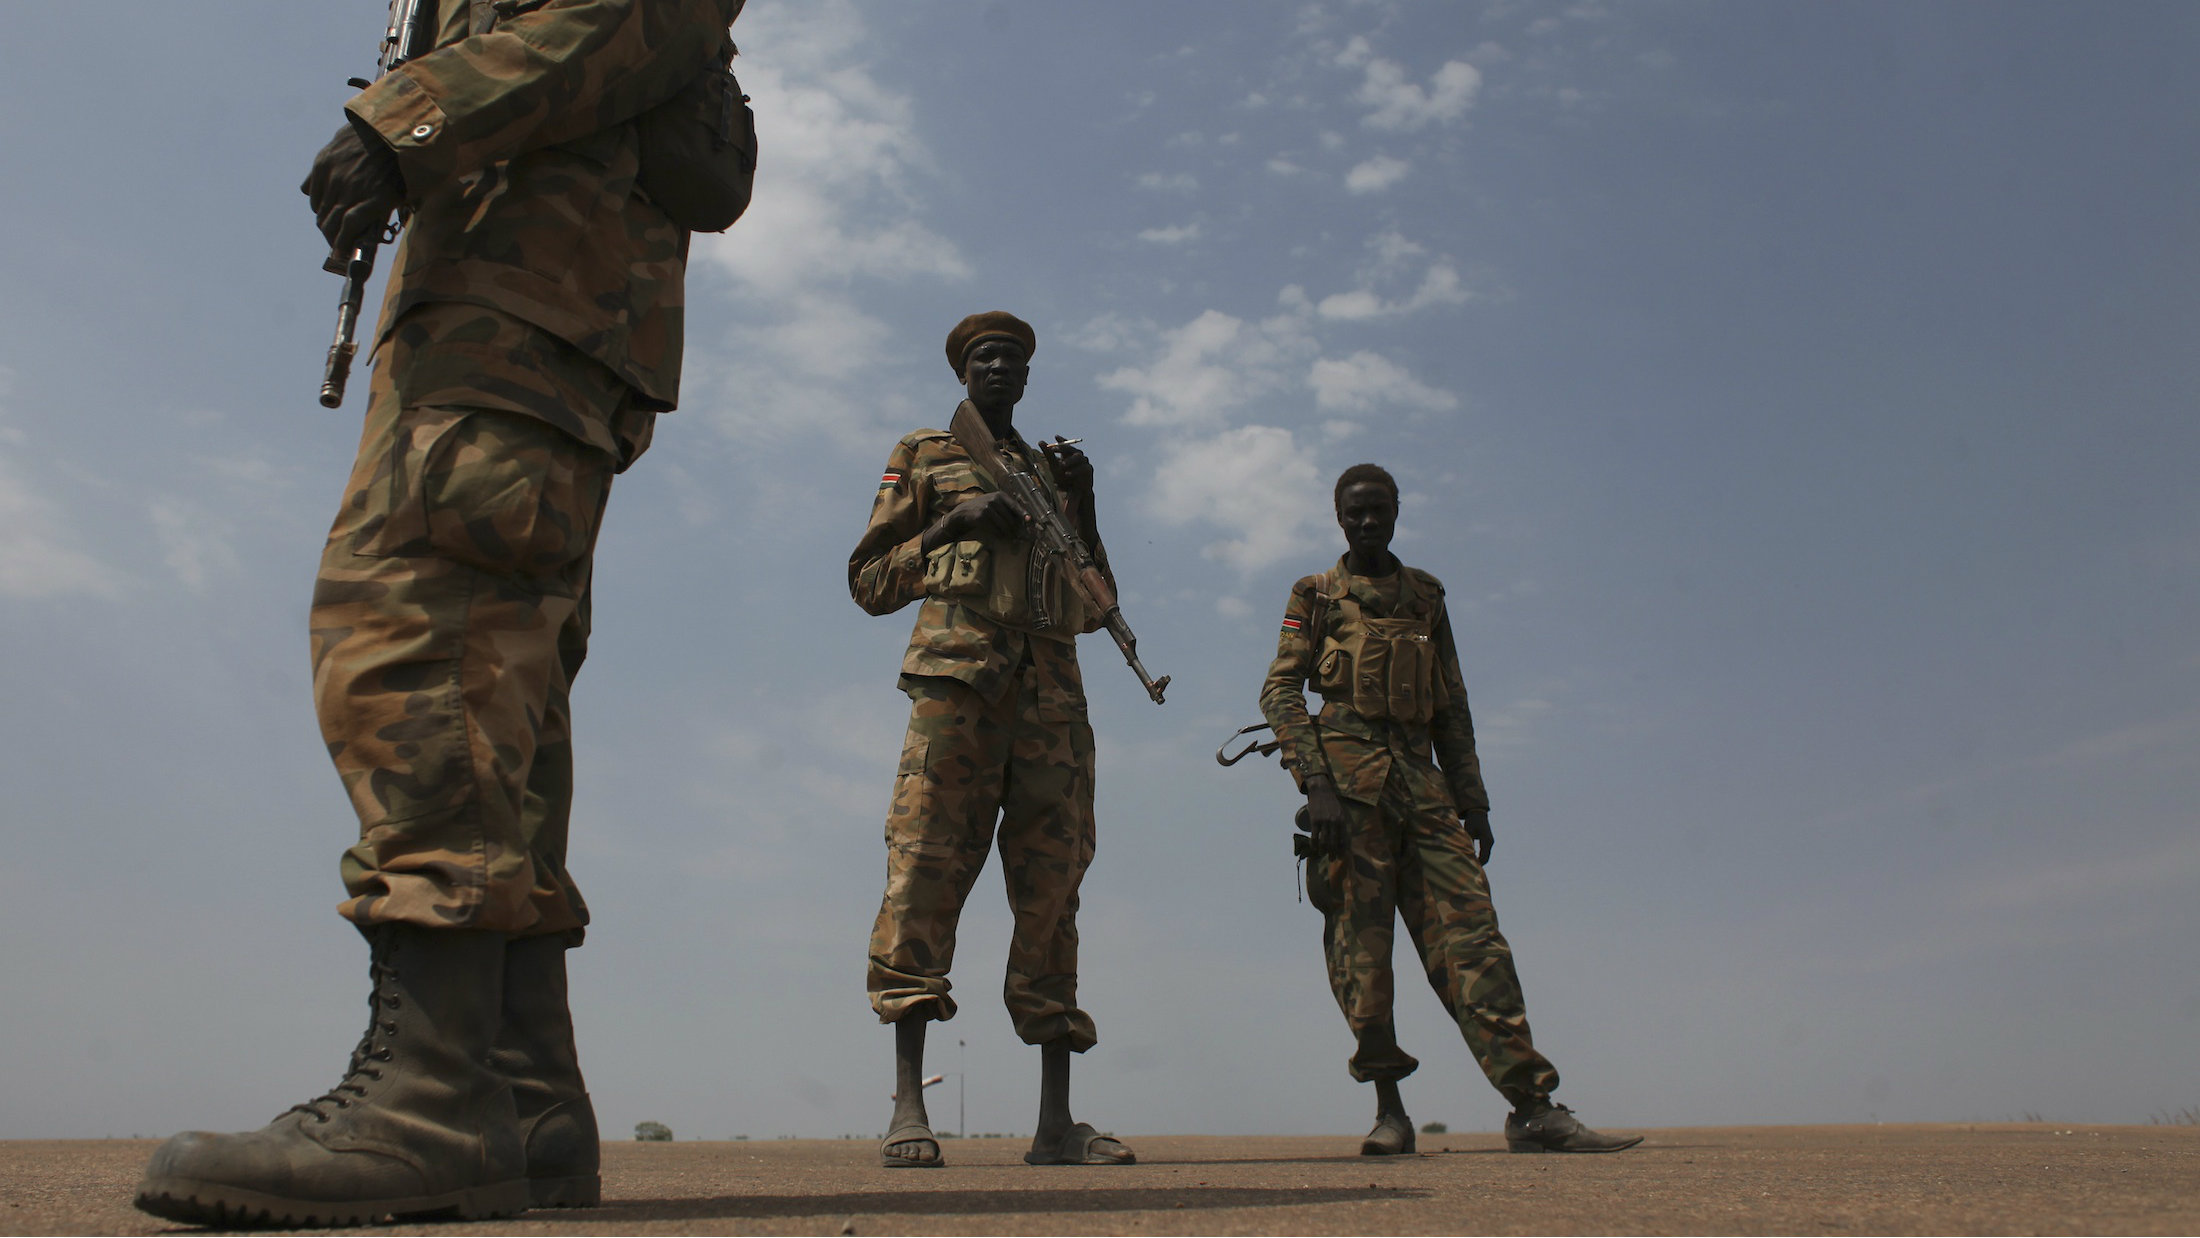 Sudan People's Liberation Army in Malakal, South Sudan